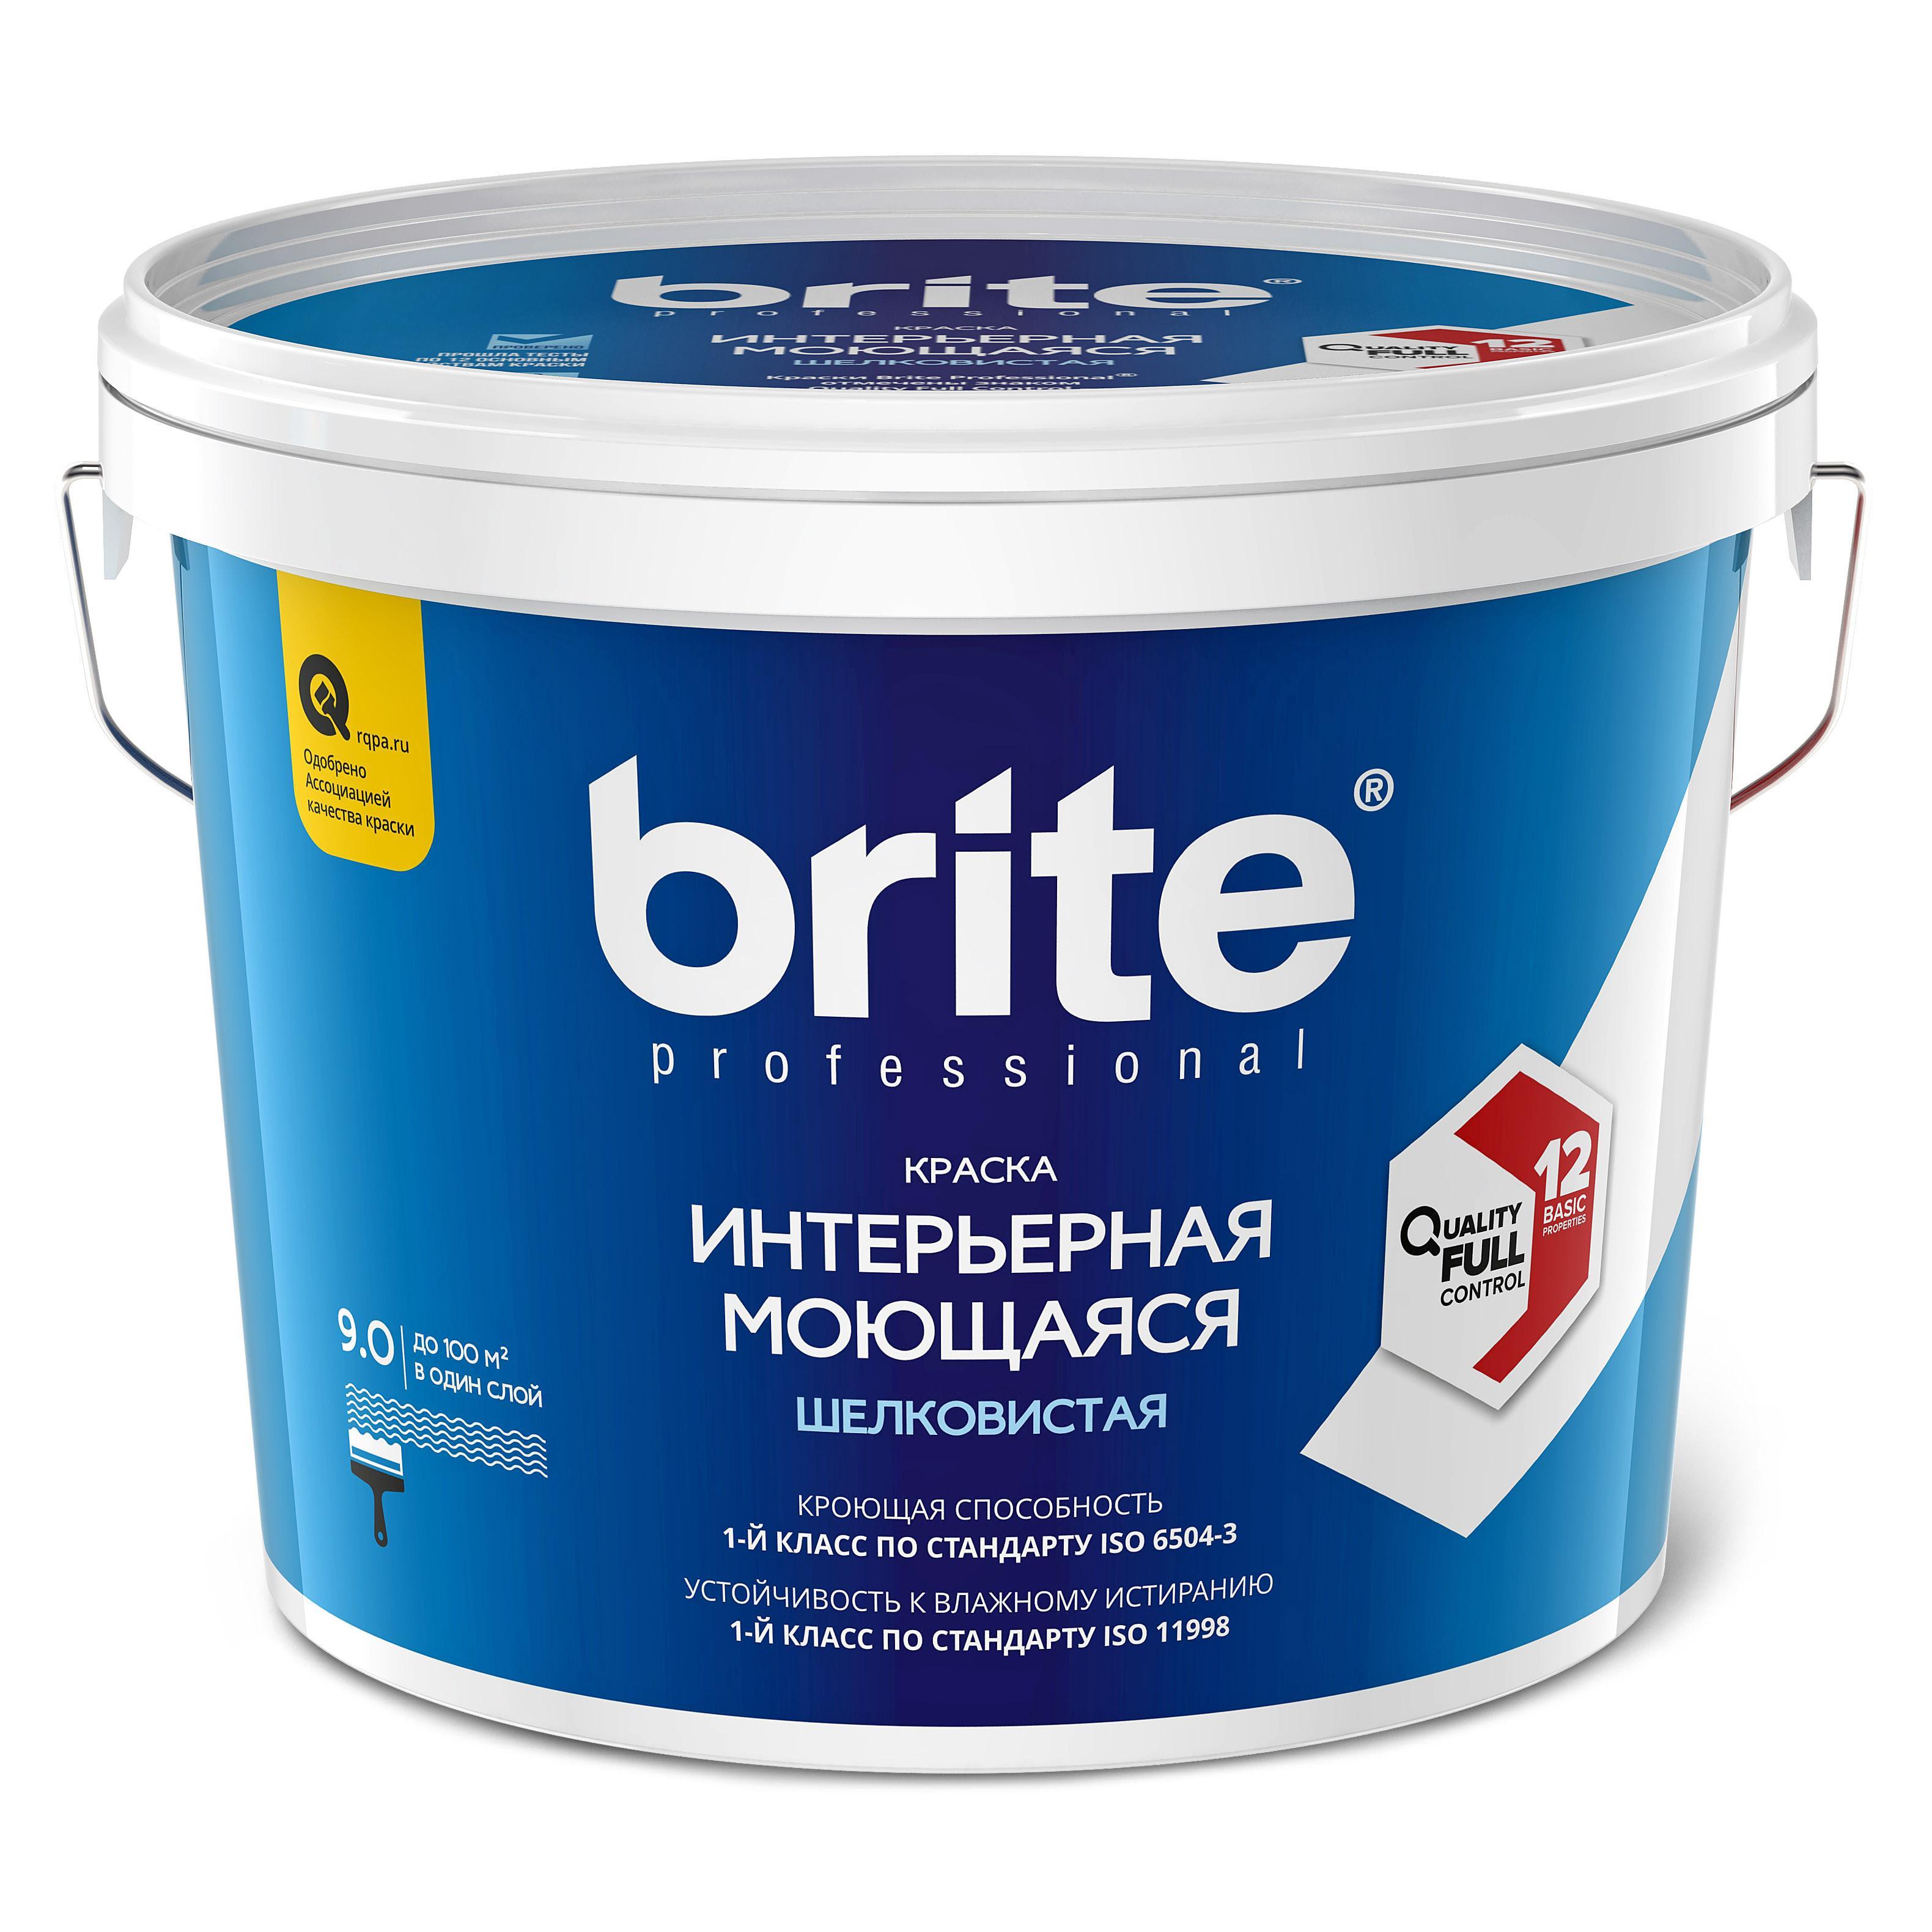 Краска моющаяся Brite Professional шелковистая, 9л (О02241)